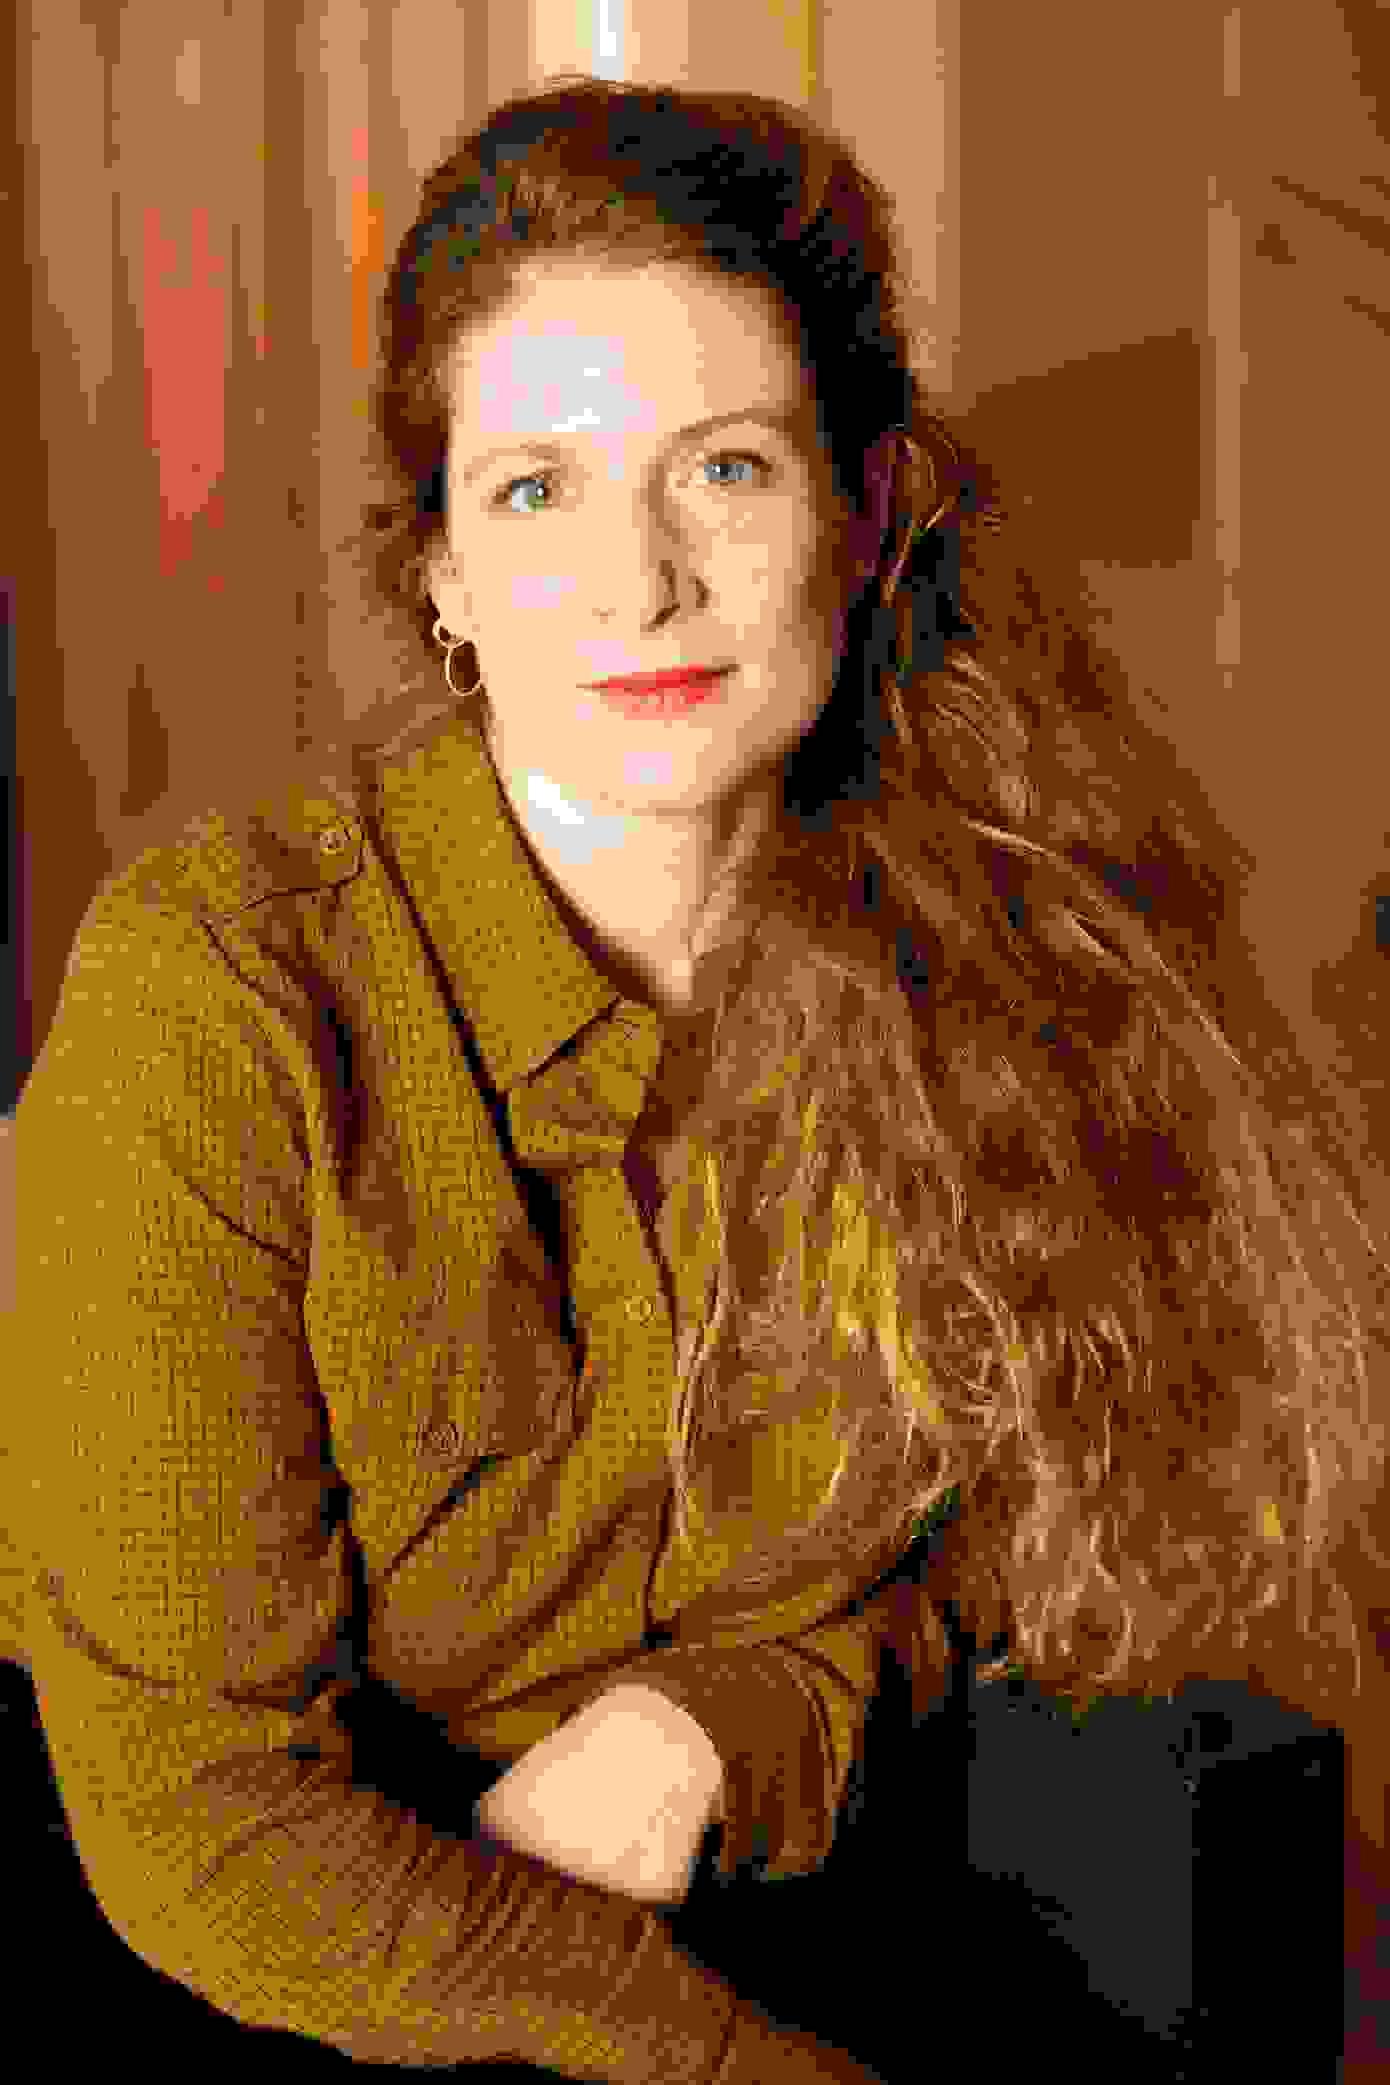 Adélaïde Bon: A Witch in Time